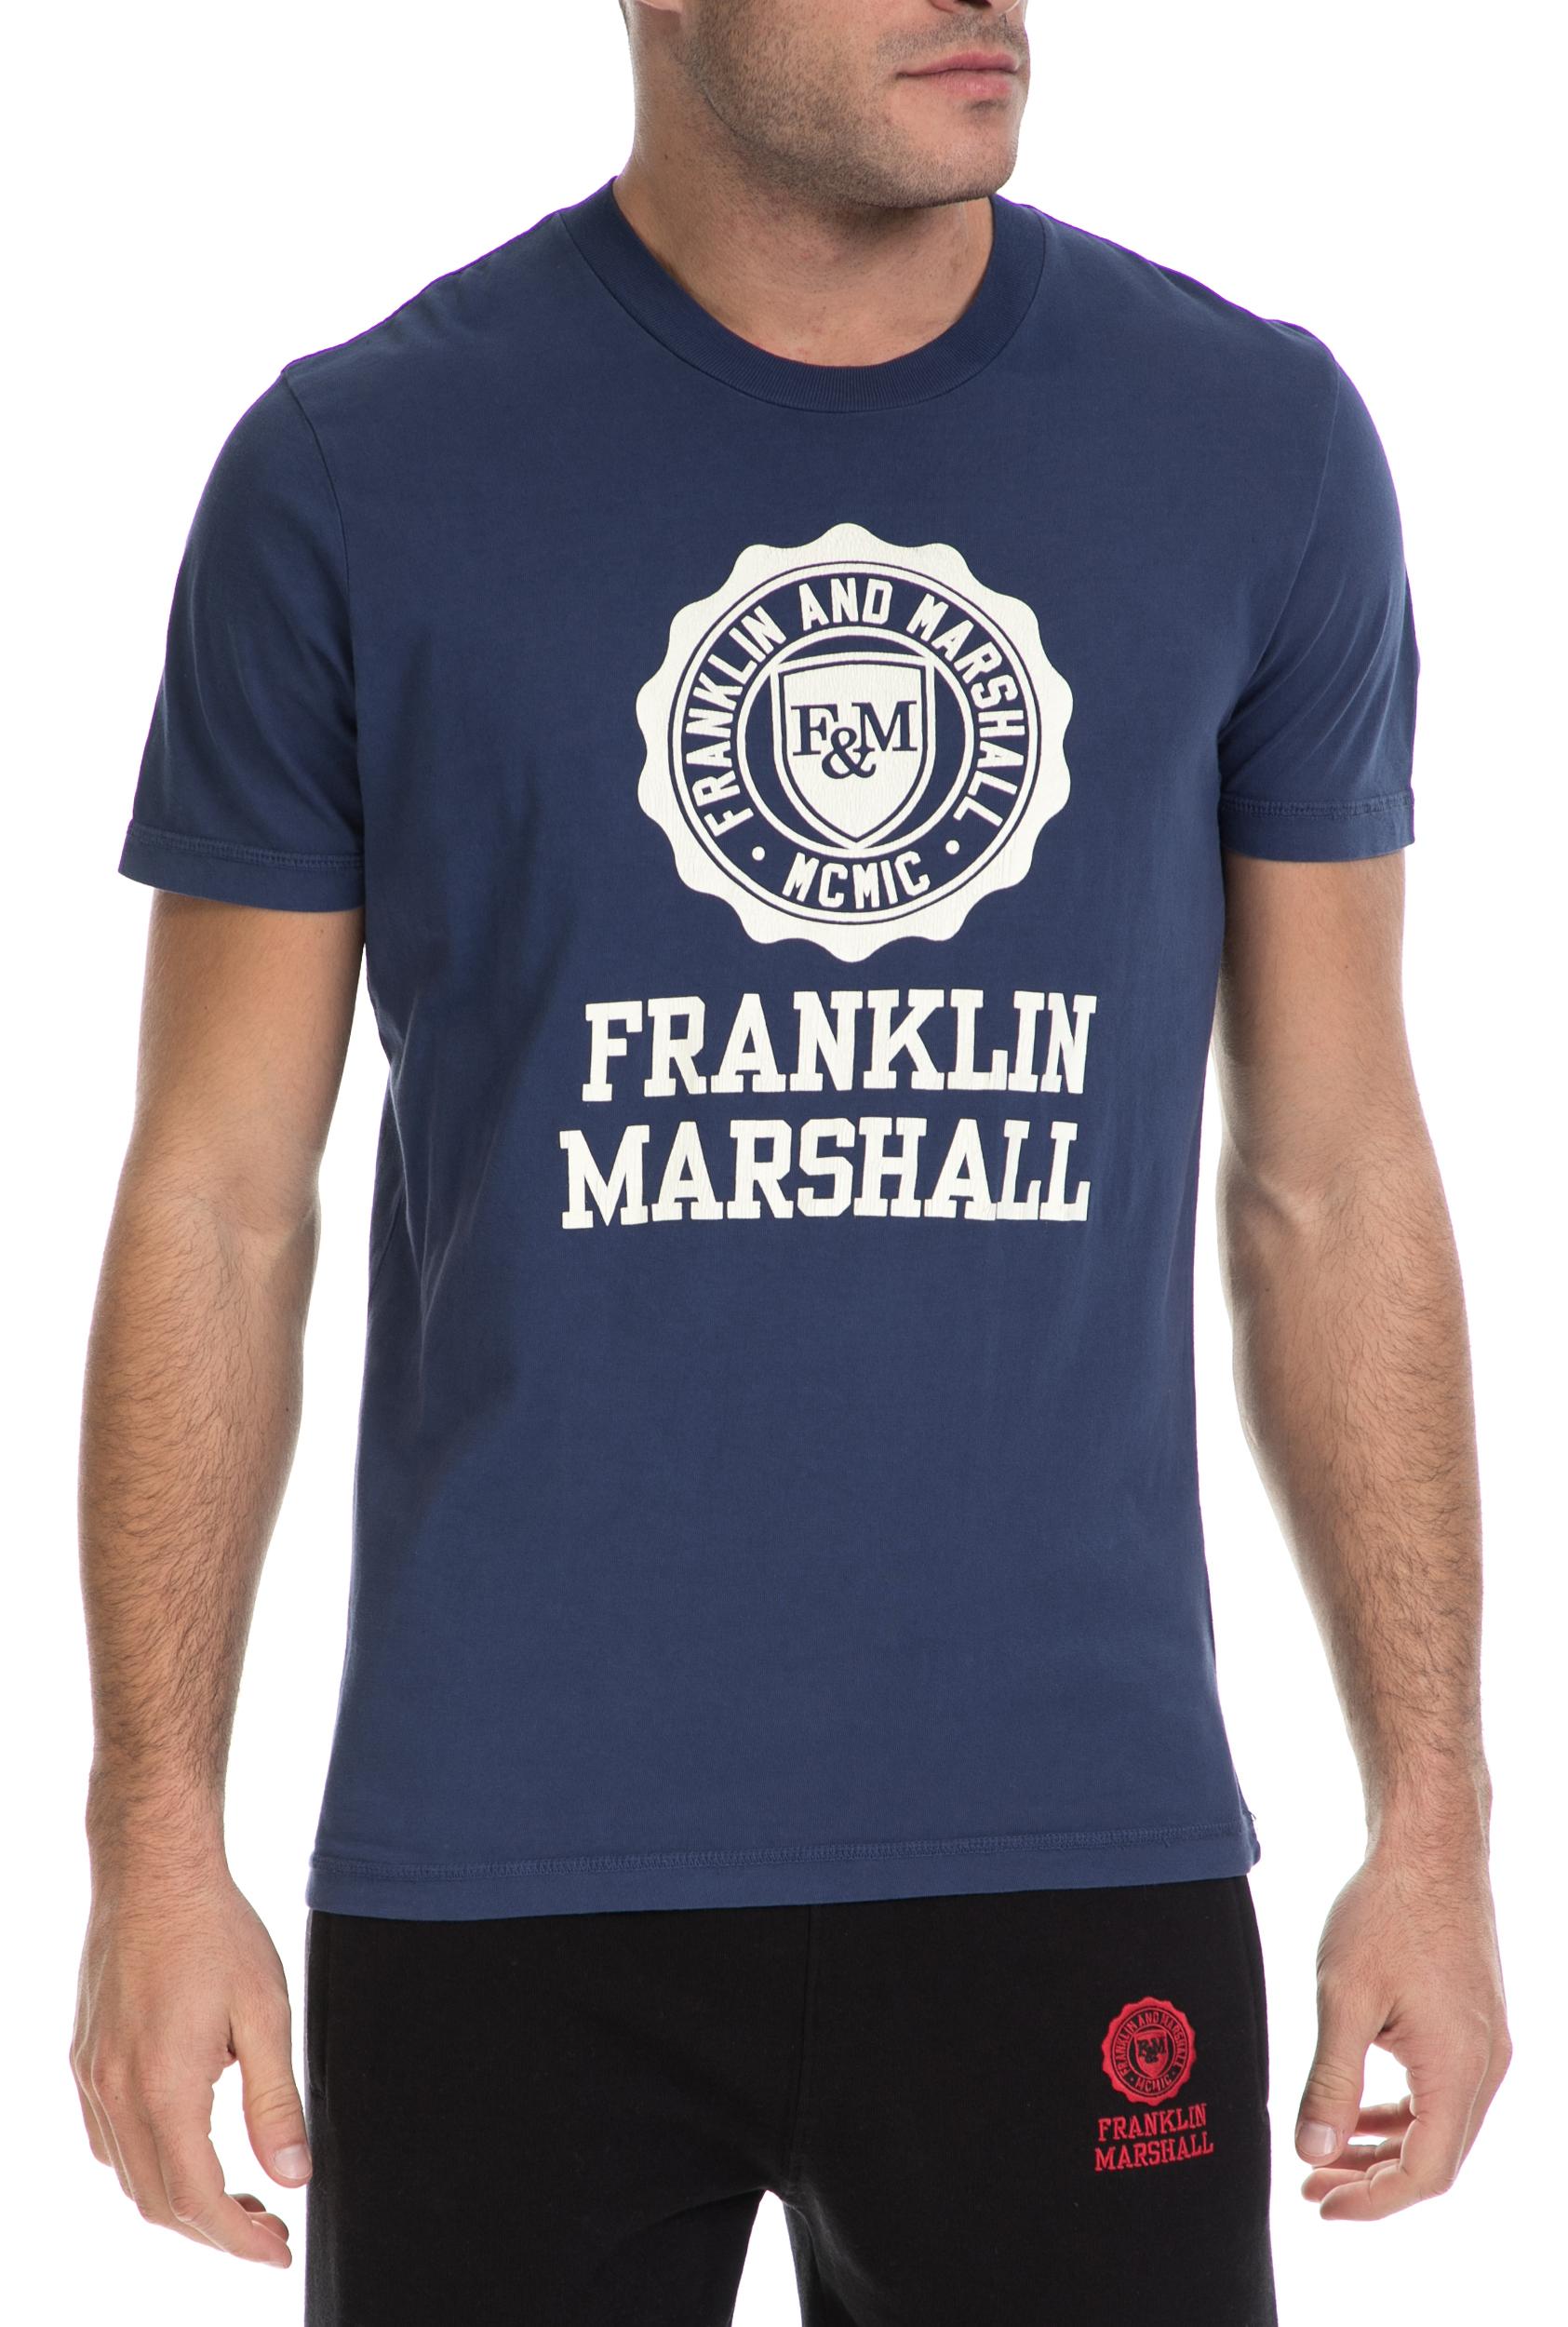 FRANKLIN & MARSHALL - Ανδρικό T-SHIRT JERSEY FRANKLIN & MARSHALL μπλε ανδρικά ρούχα μπλούζες κοντομάνικες